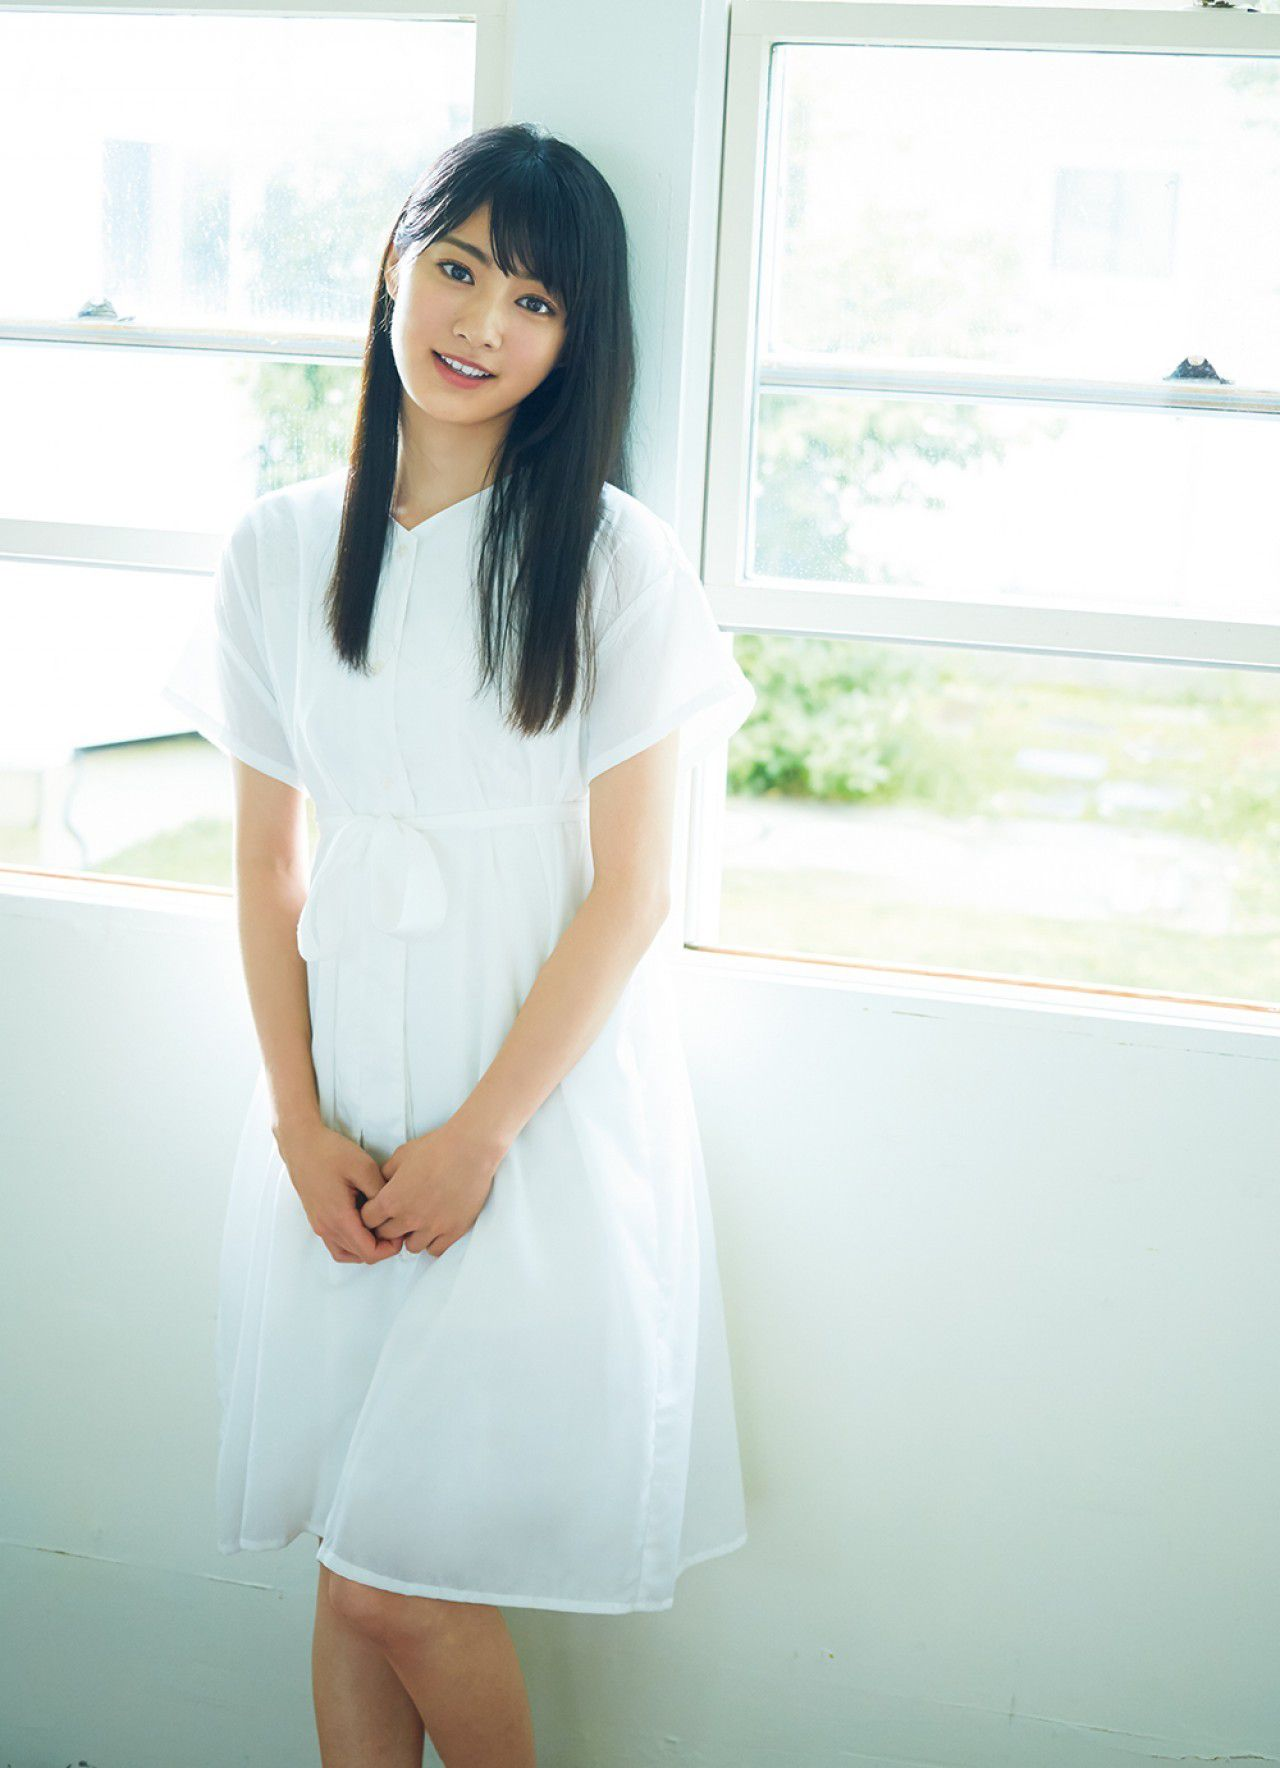 Yasuko Koga, a pure and innocent girl from The Last Idol001